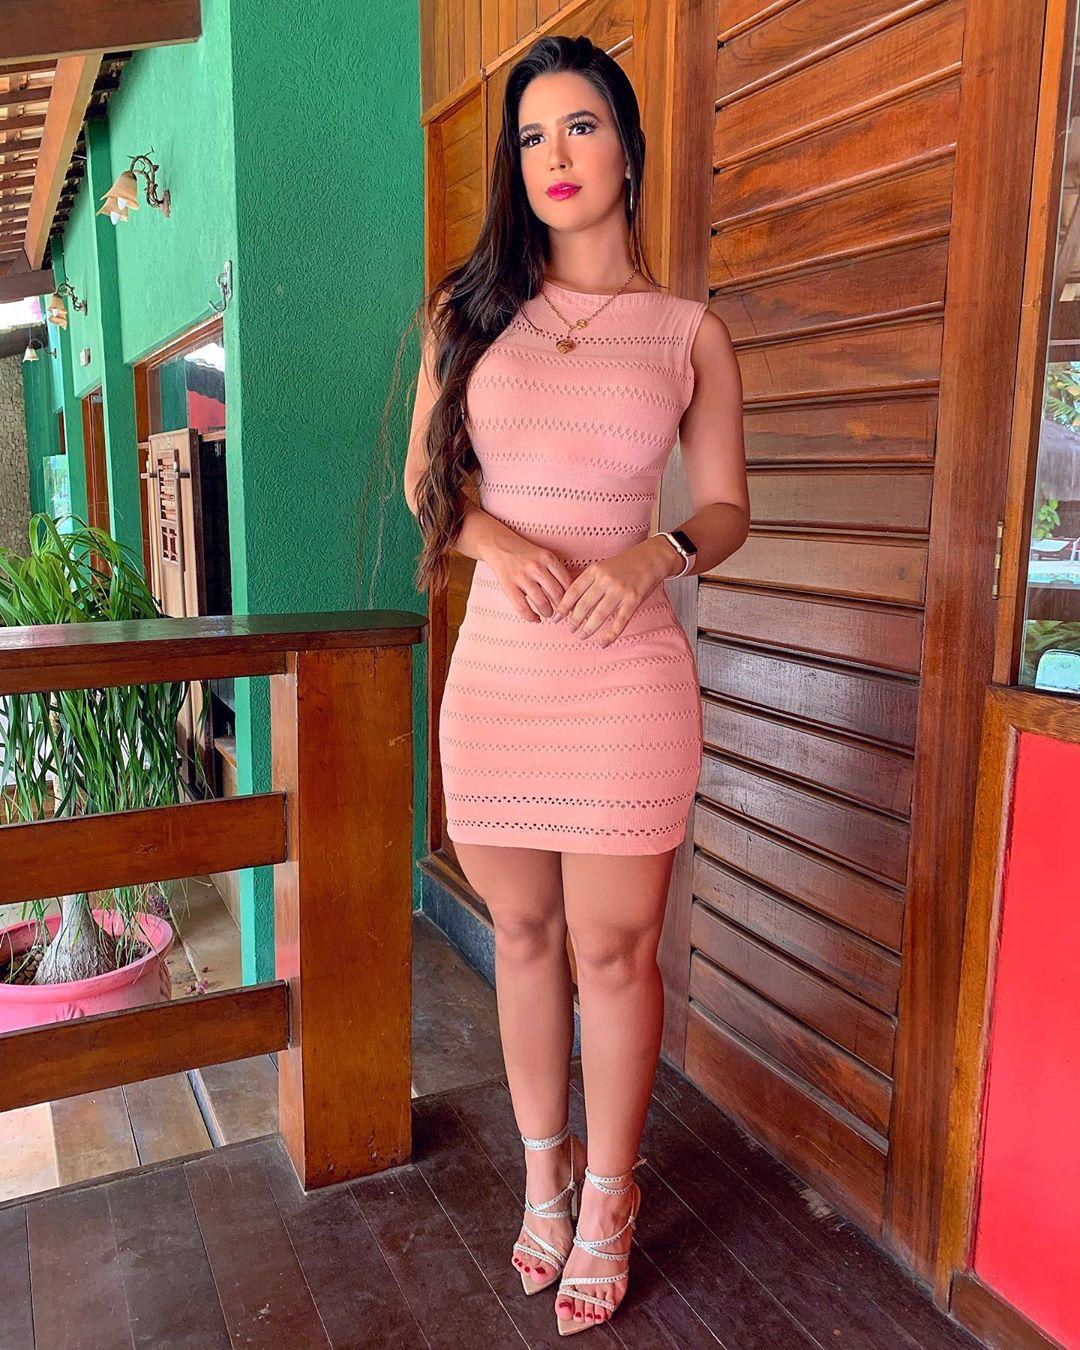 Amanda-Gomes-Wallpapers-Insta-Fit-Bio-9